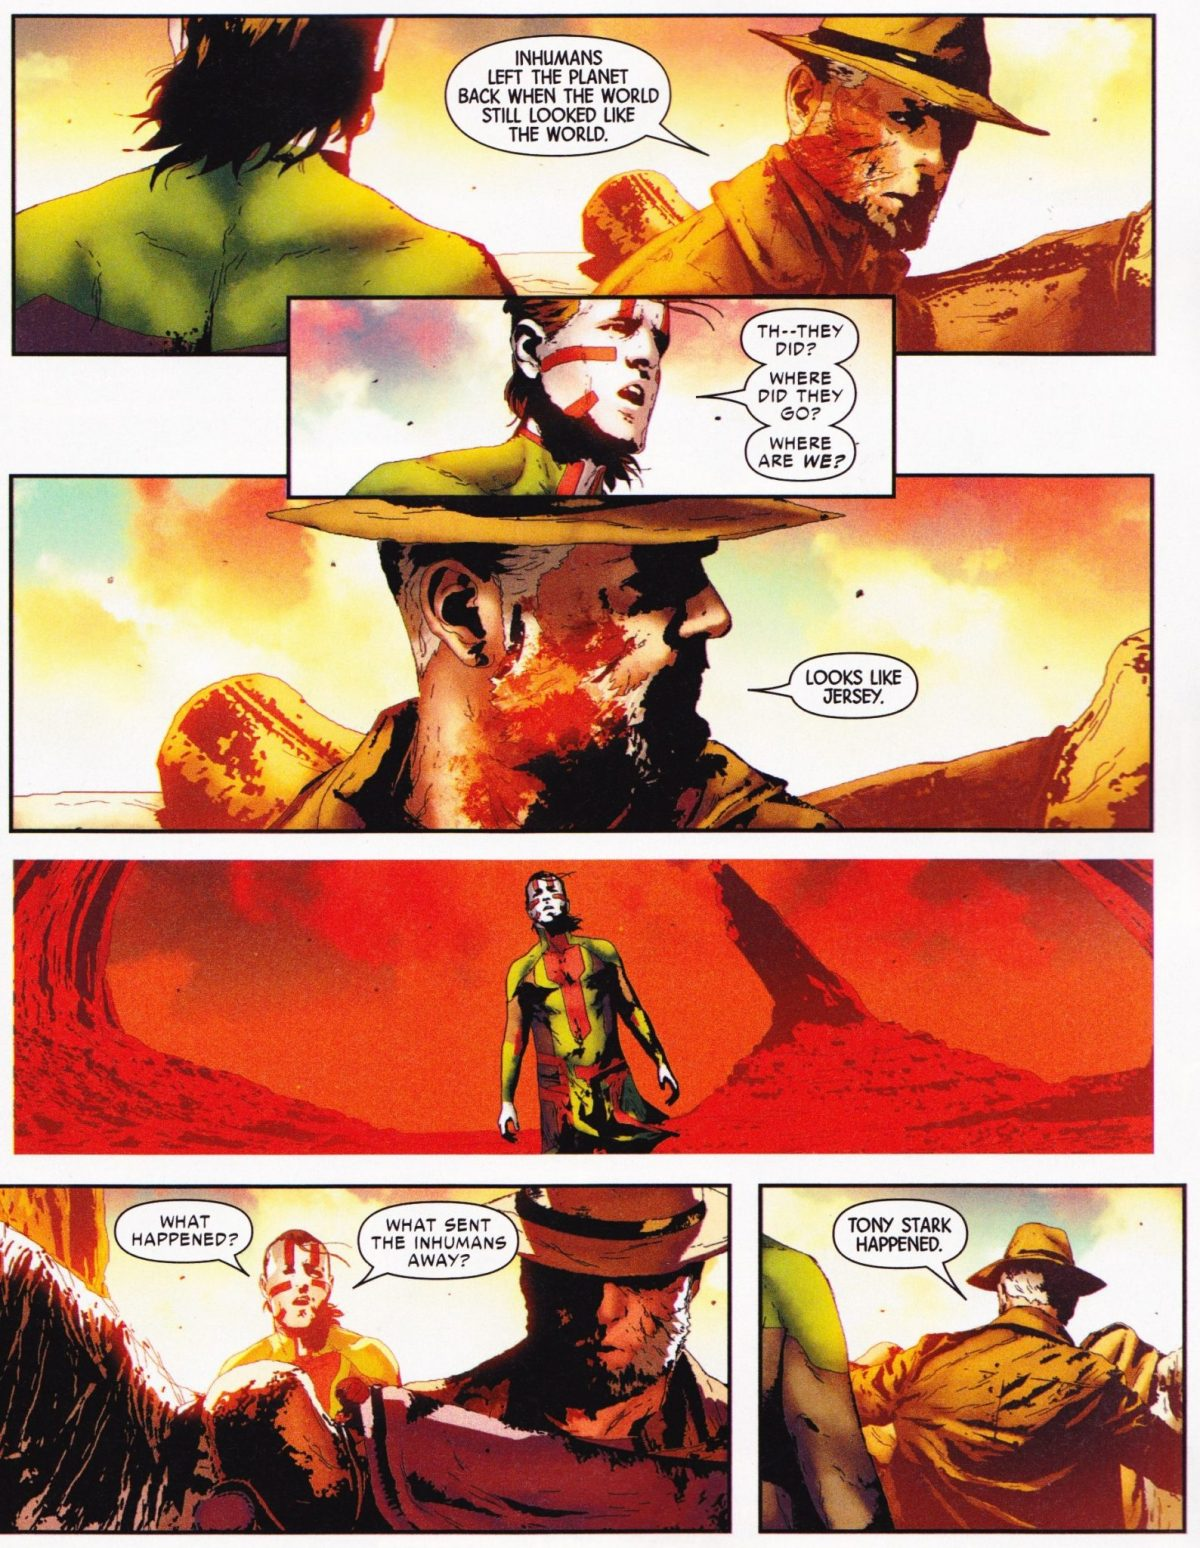 O Velho Logan e Ulisses - Guerra Civil II: Tony Stark está morto?